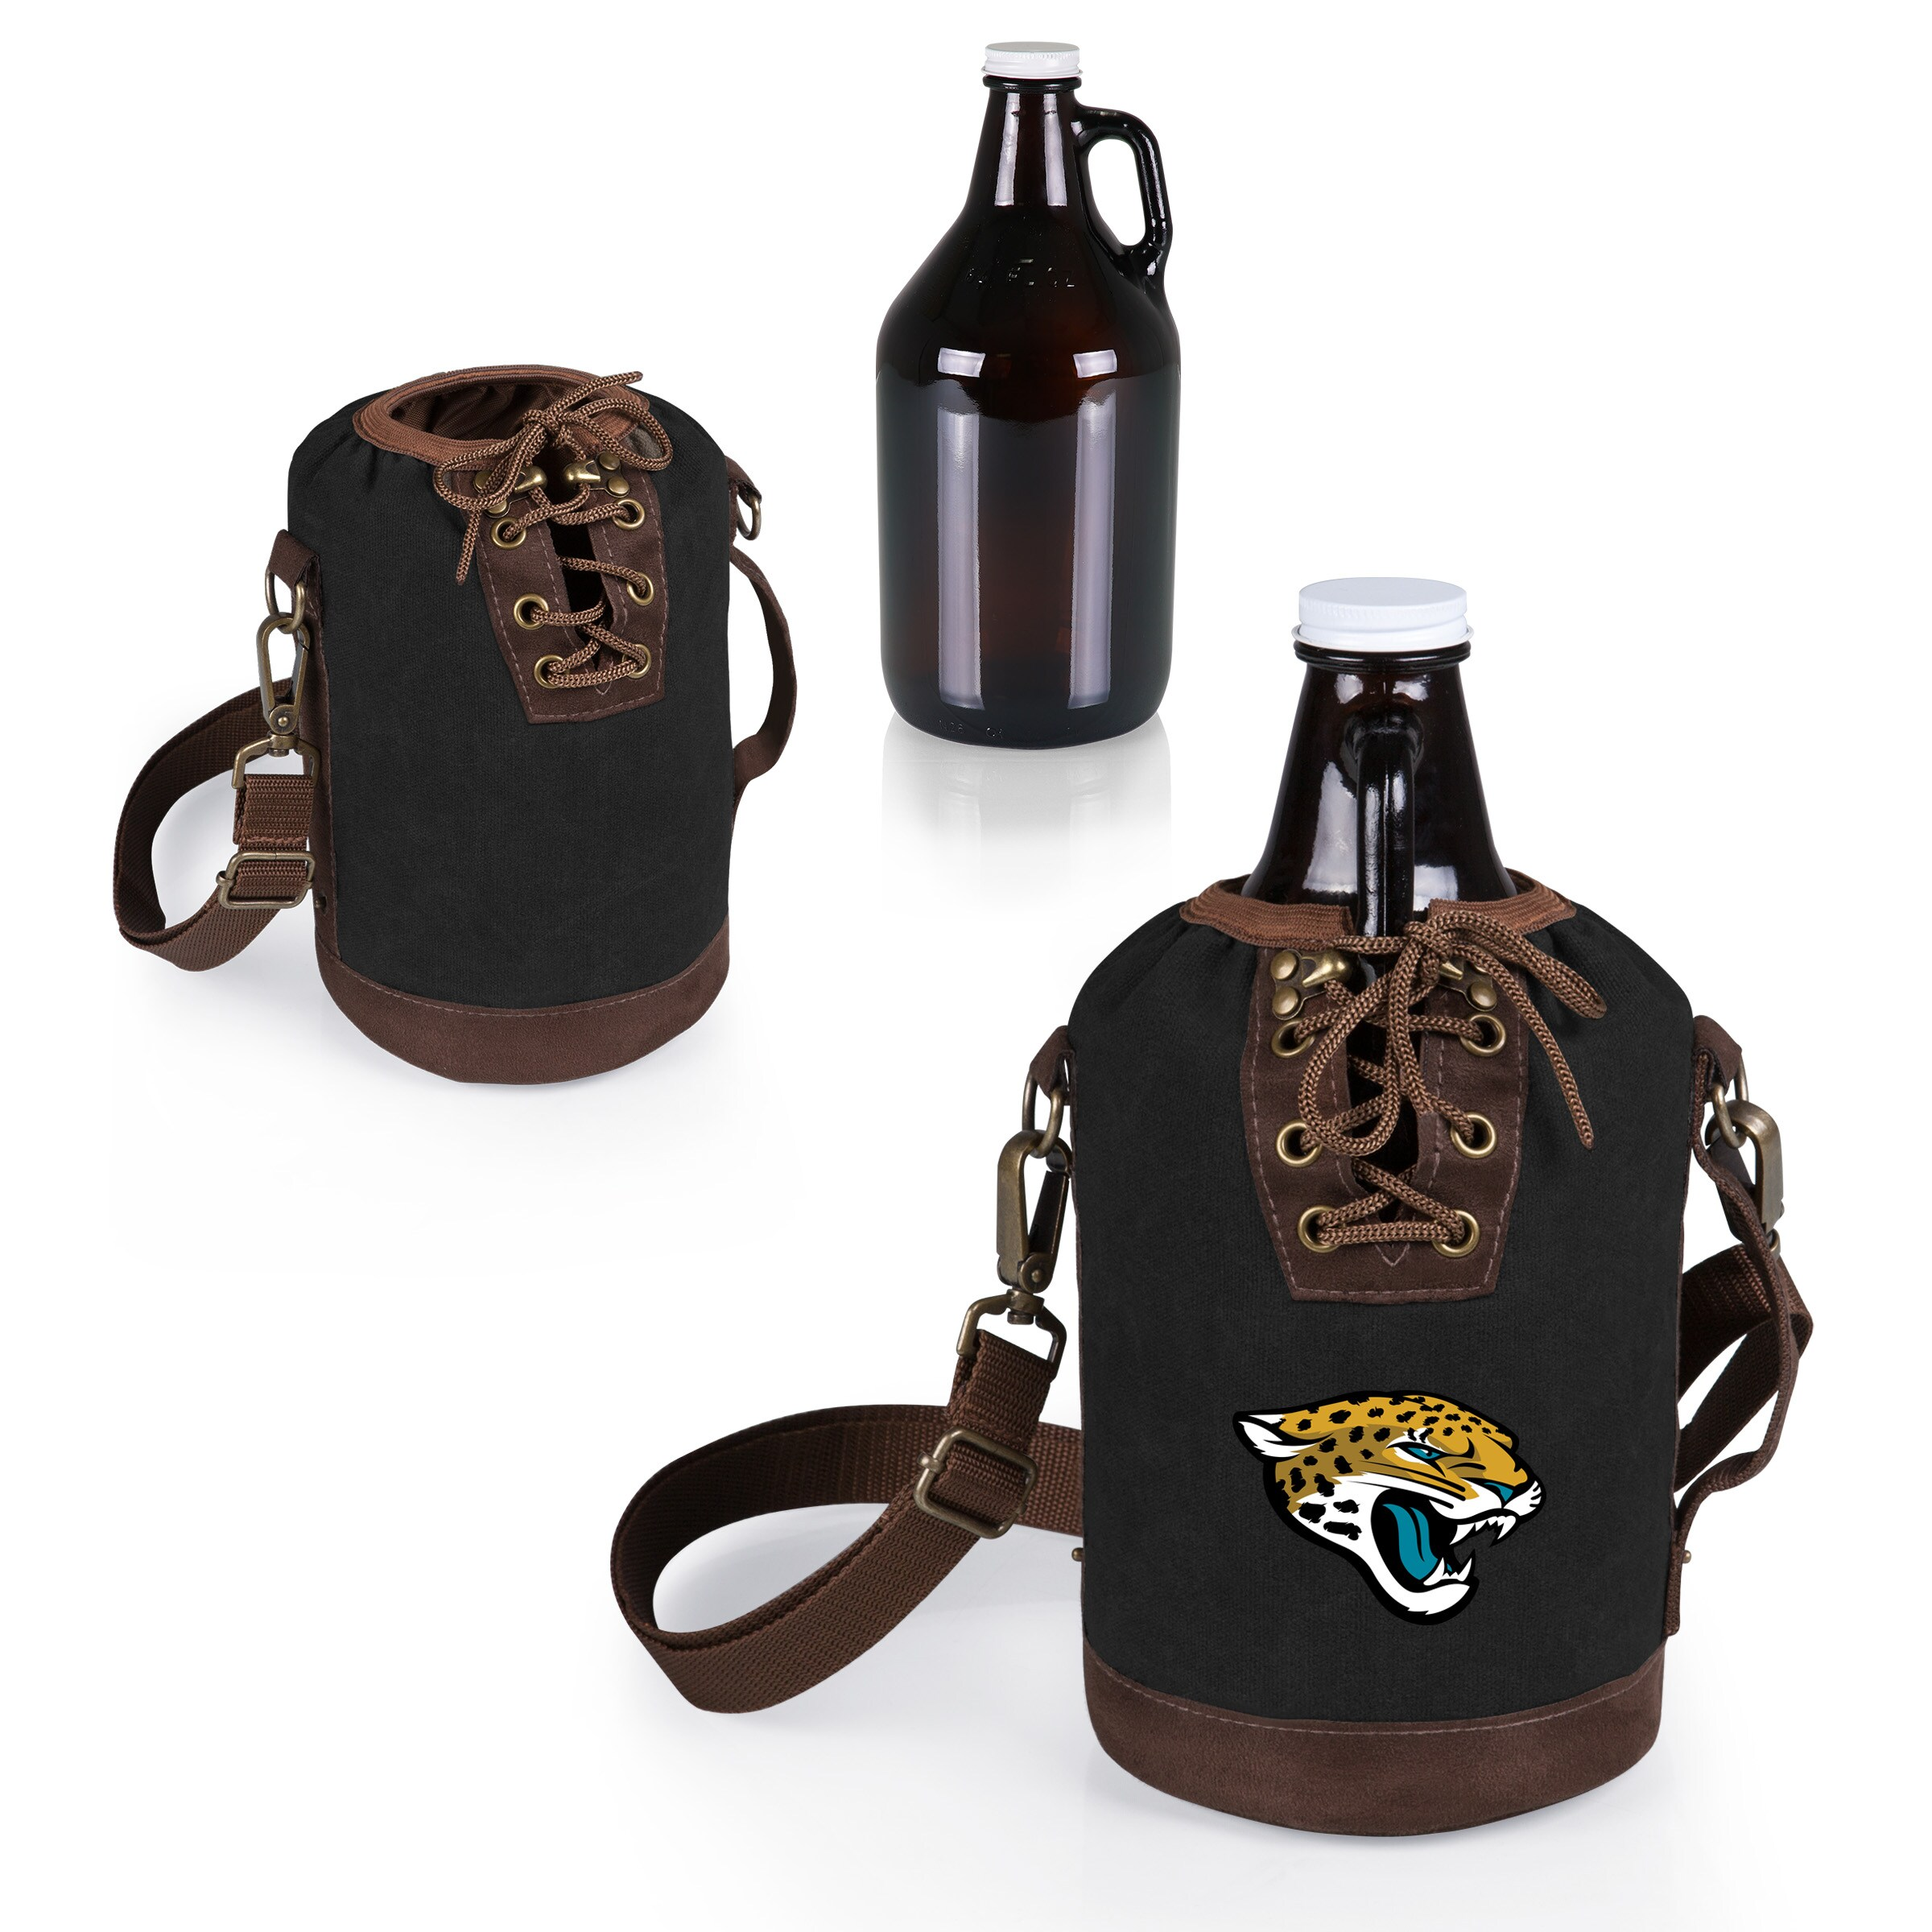 Jacksonville Jaguars Growler Tote with 64oz. Growler - Black